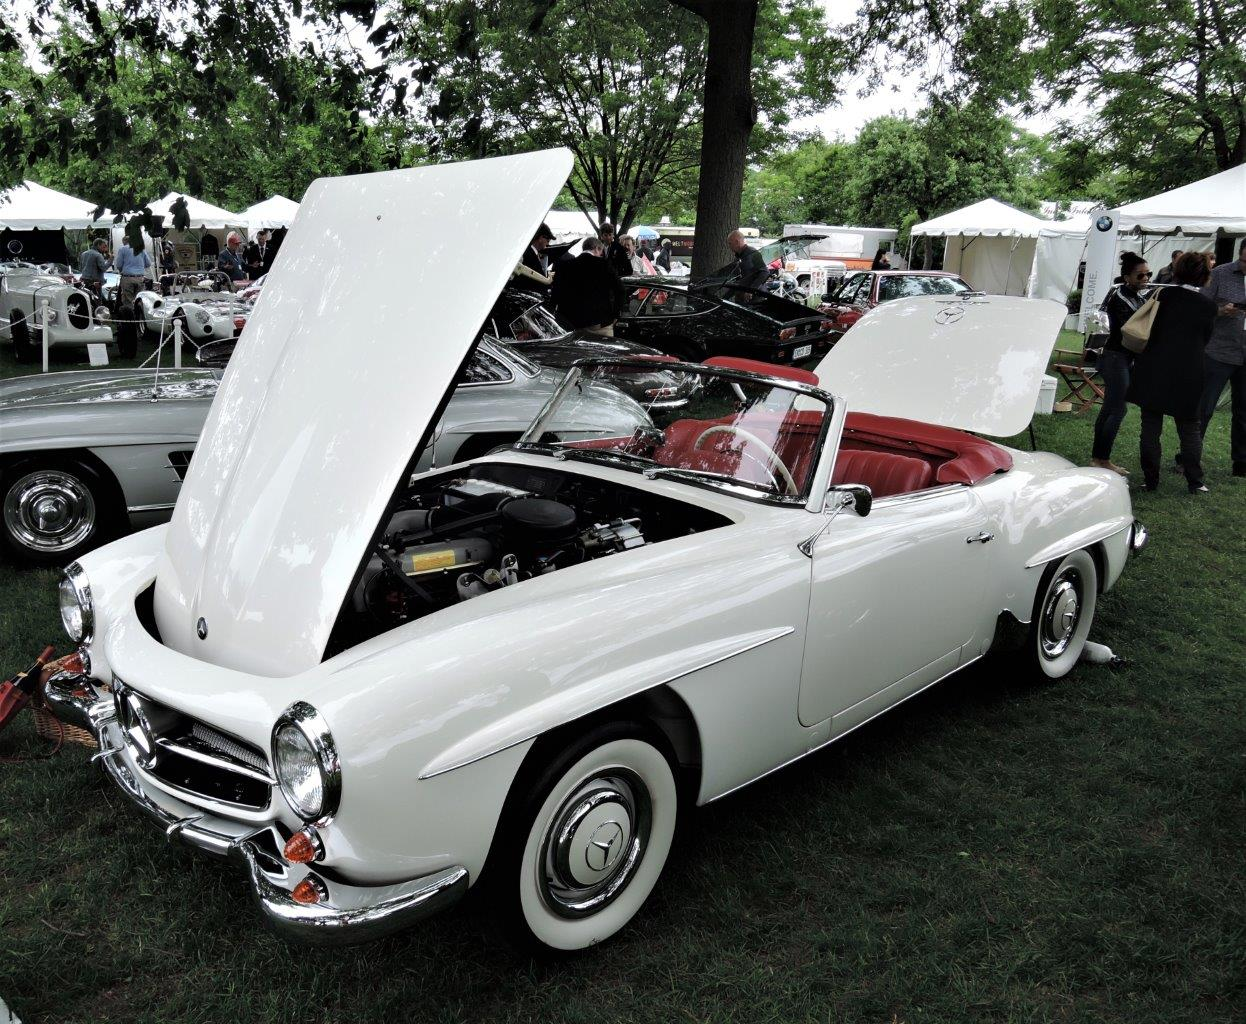 white 1963 Mercedes-Benz 190 SL - 2018 Greenwich Concours International